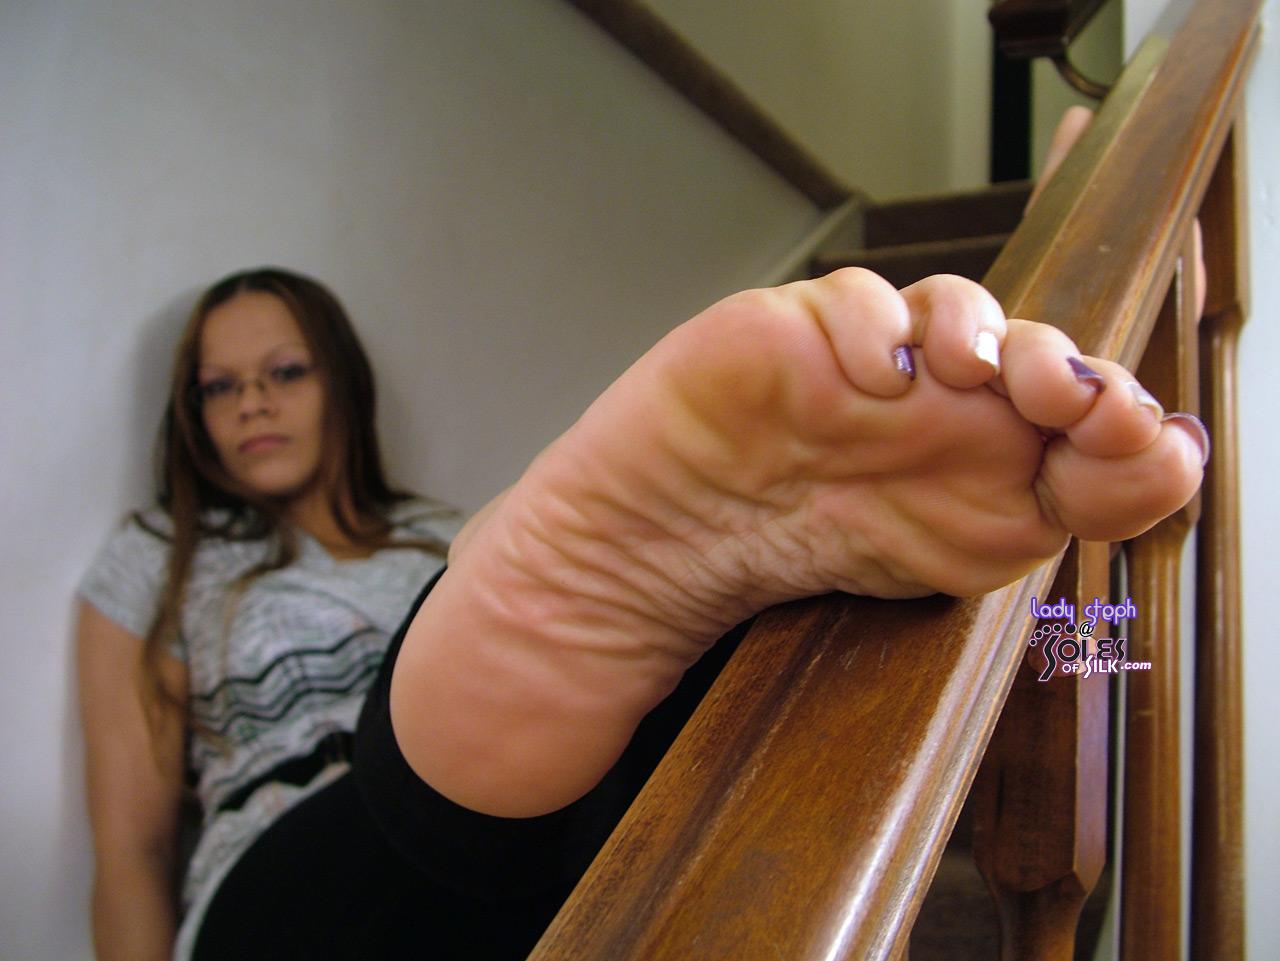 Lady footjob